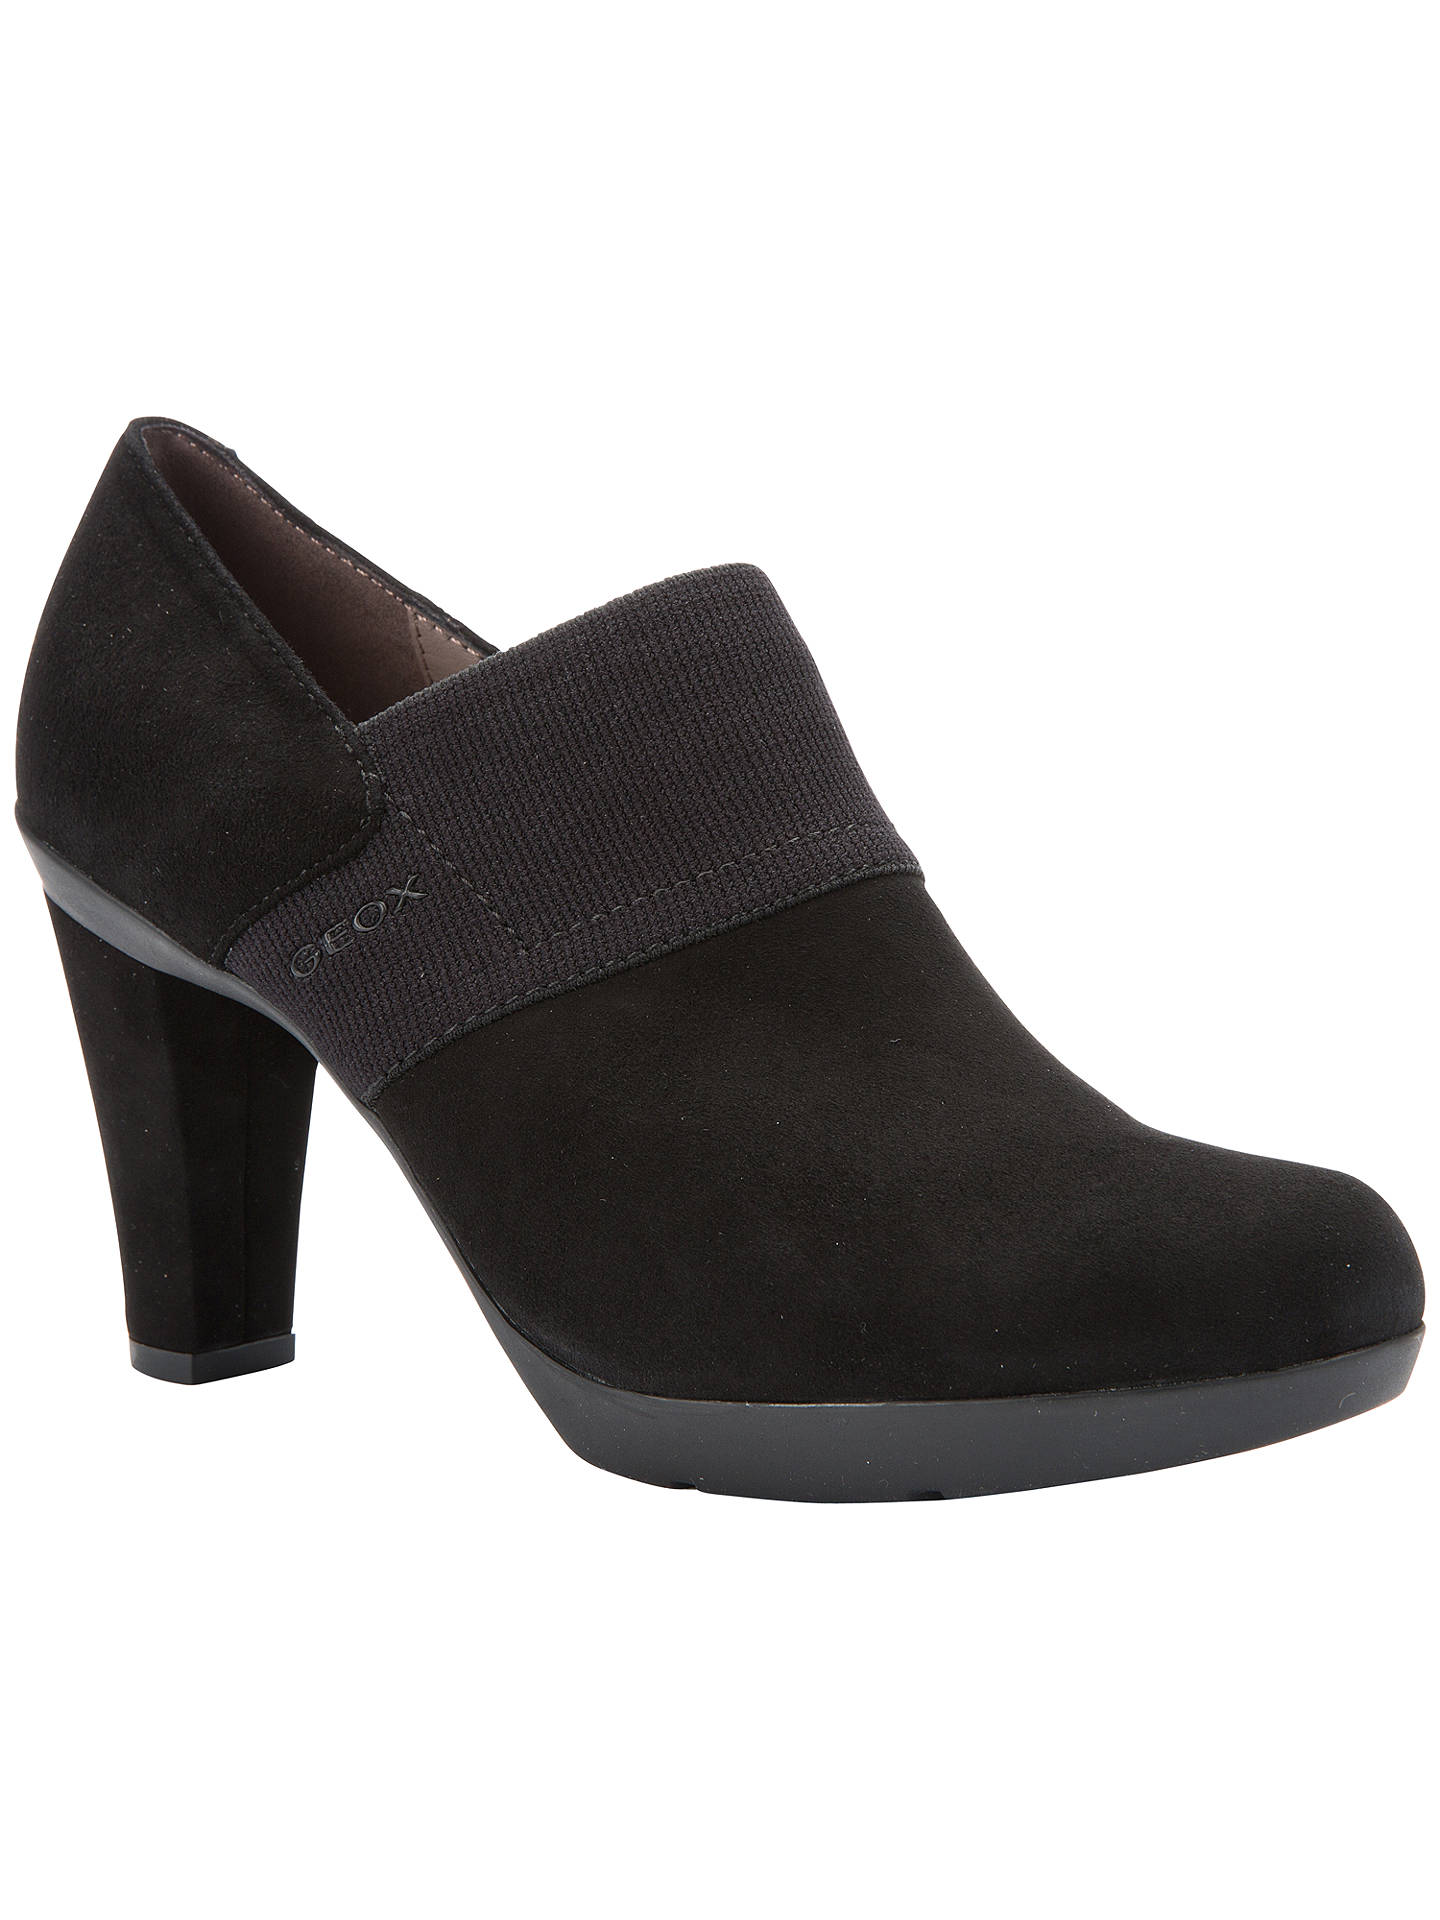 Suede Heeled Block Women's Geox Shoe BootsBlack Inspiration H9DIE2